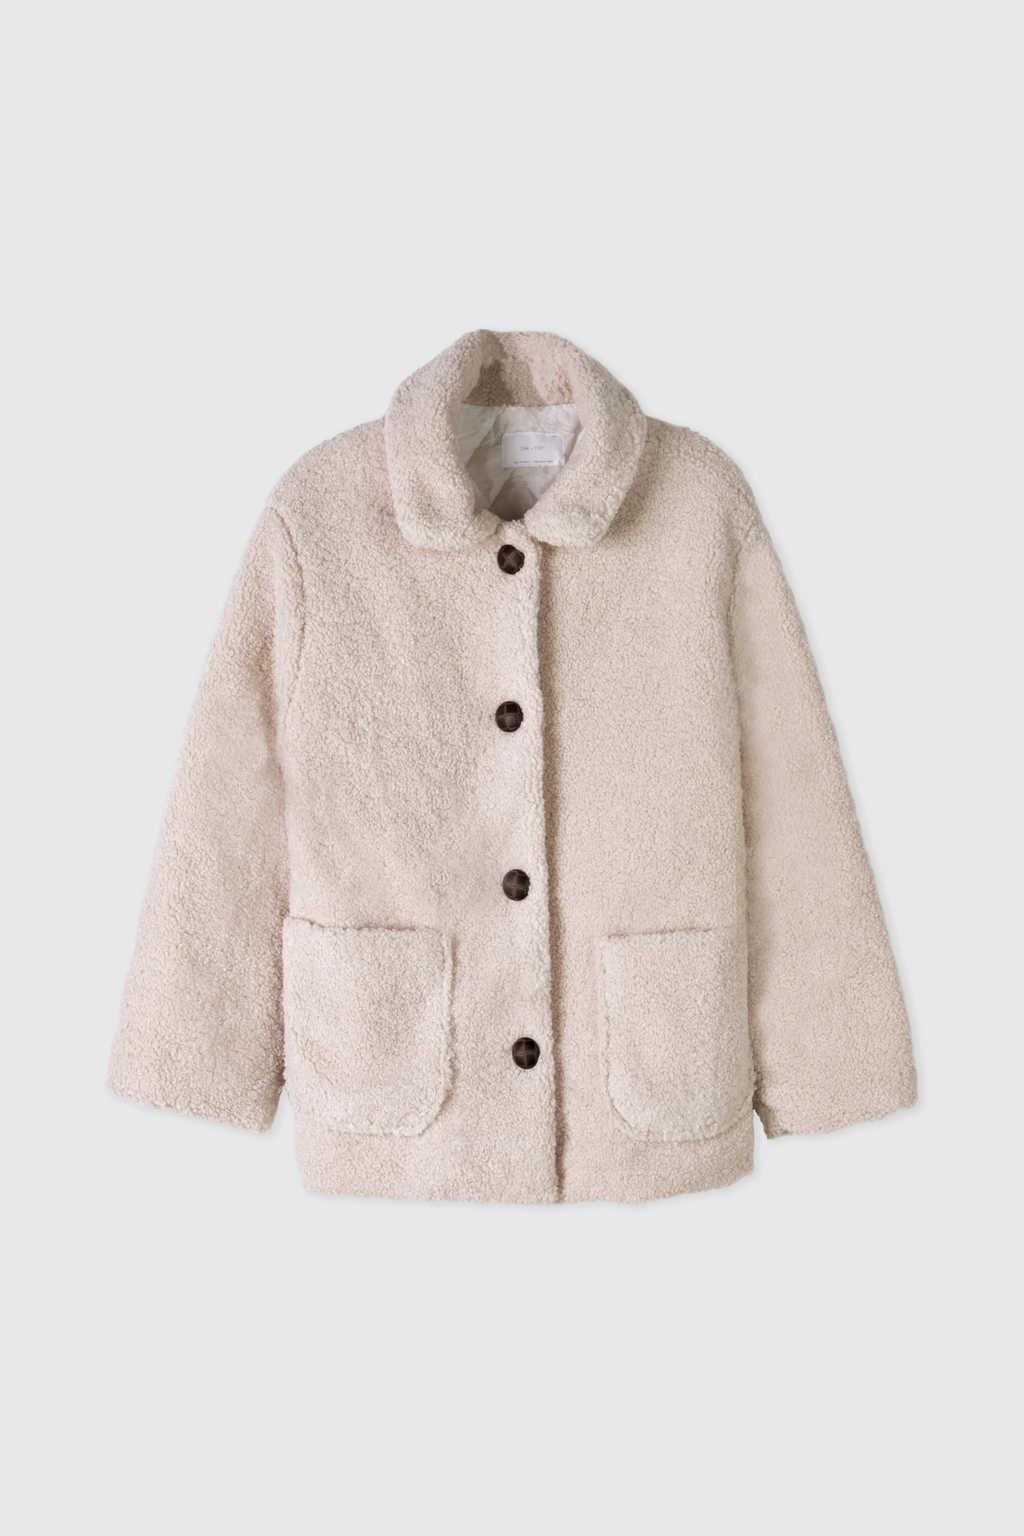 Jacket J001K Cream 7